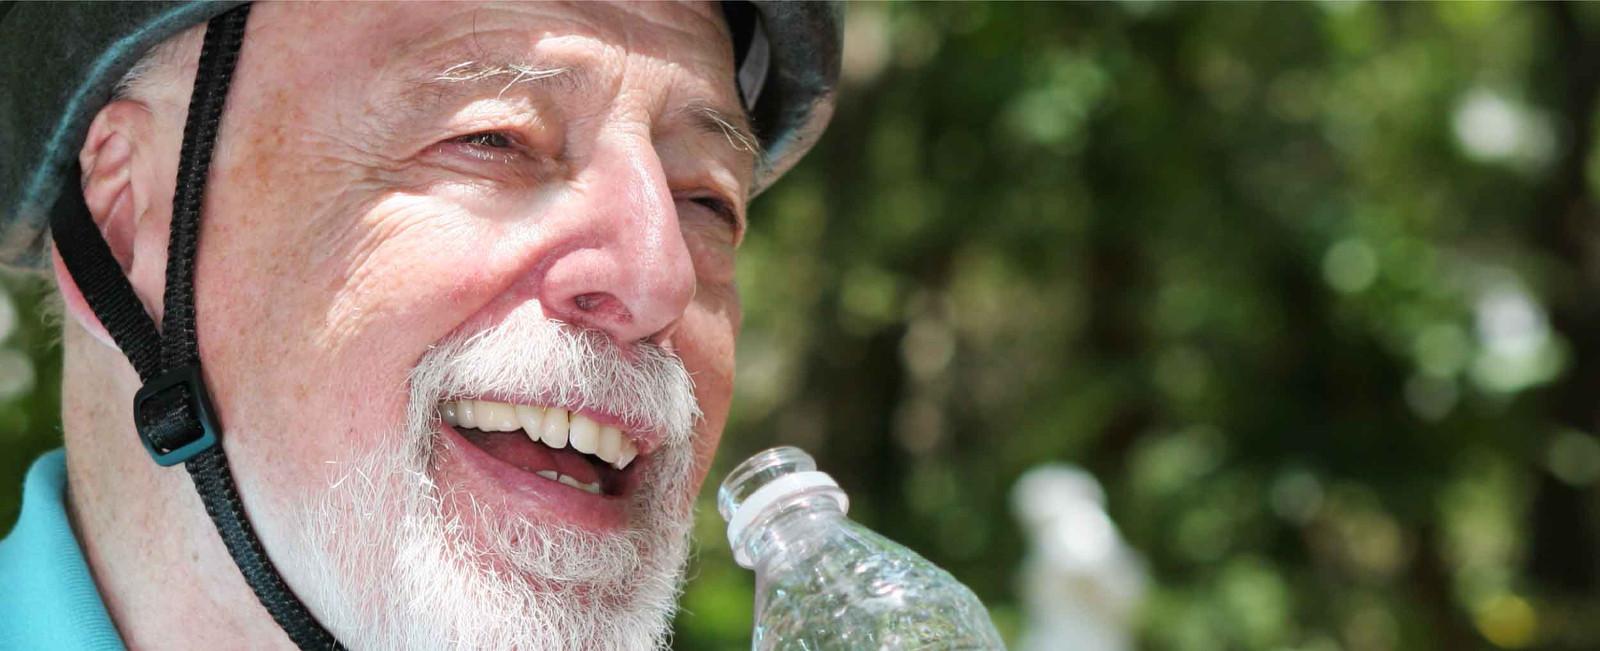 Hidratación en la tercera edad | Agua MIneral Natural